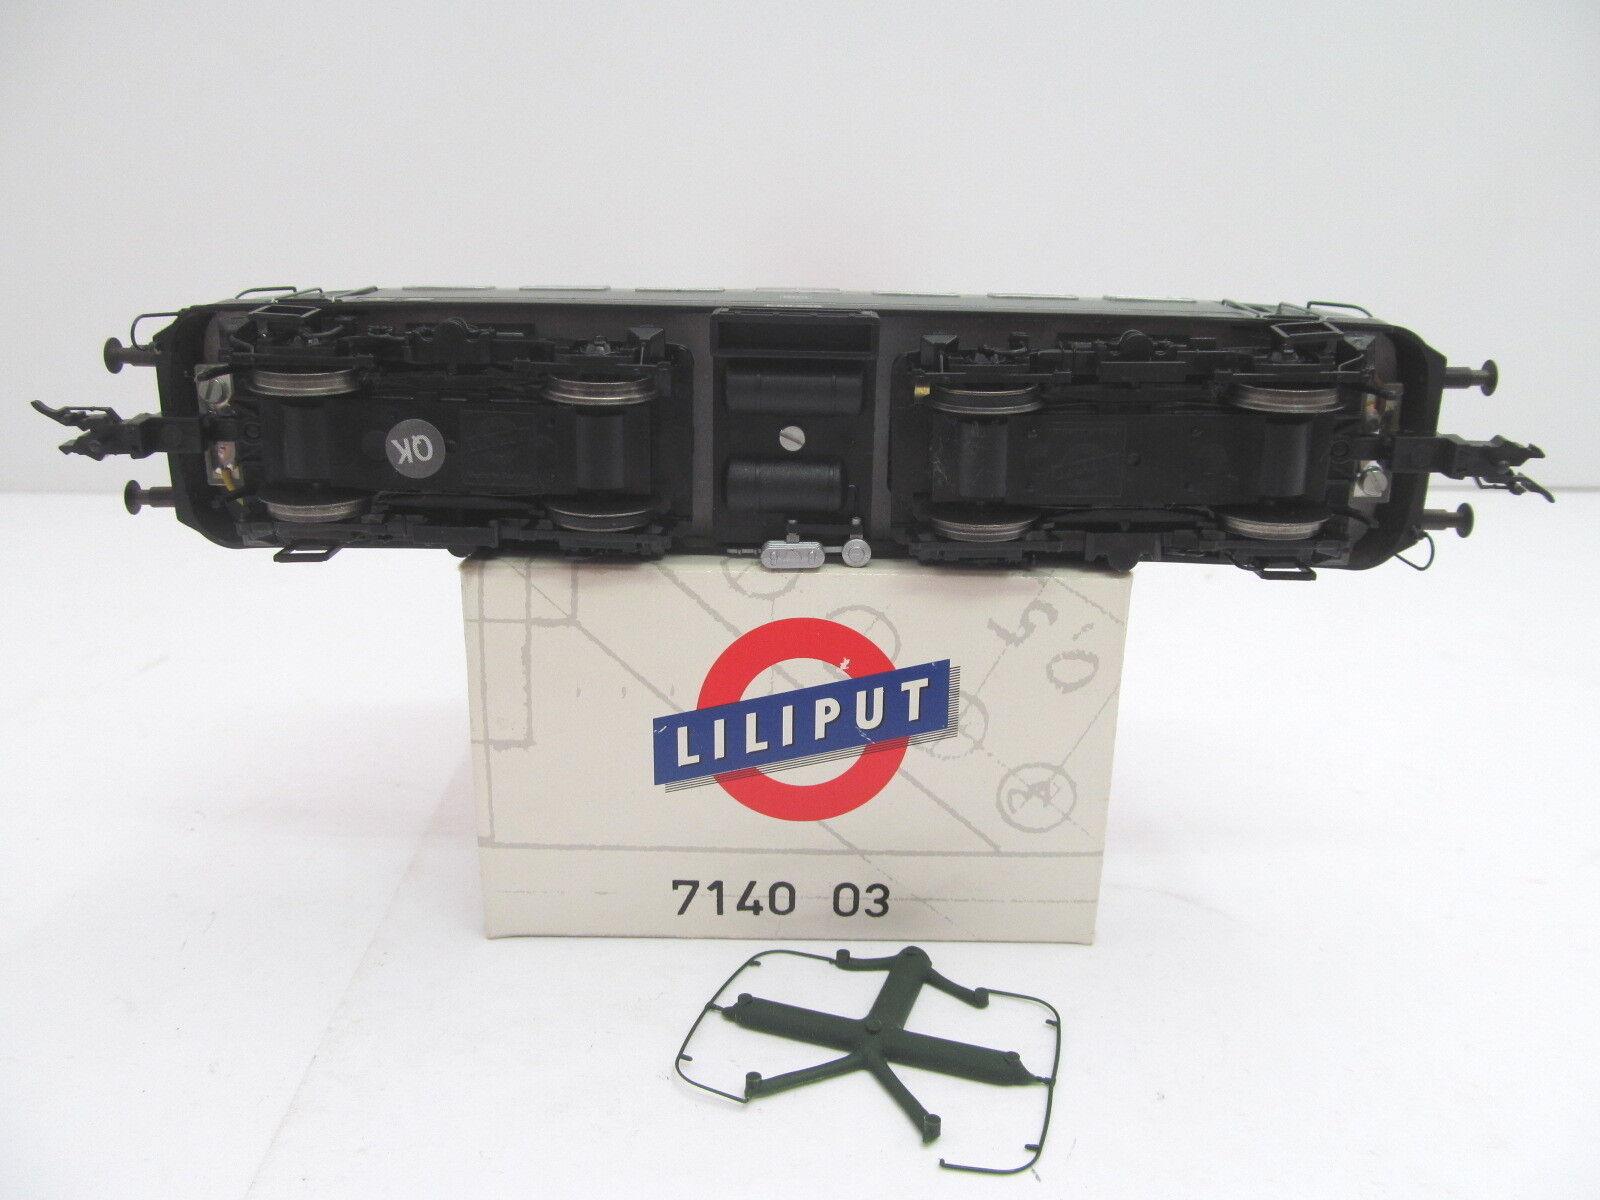 MES-44213 Liliput 714003 H0 E-Lok DB E40 298 sehr guter guter guter Zustand,Funktion geprüft  | Wunderbar  2be0f4